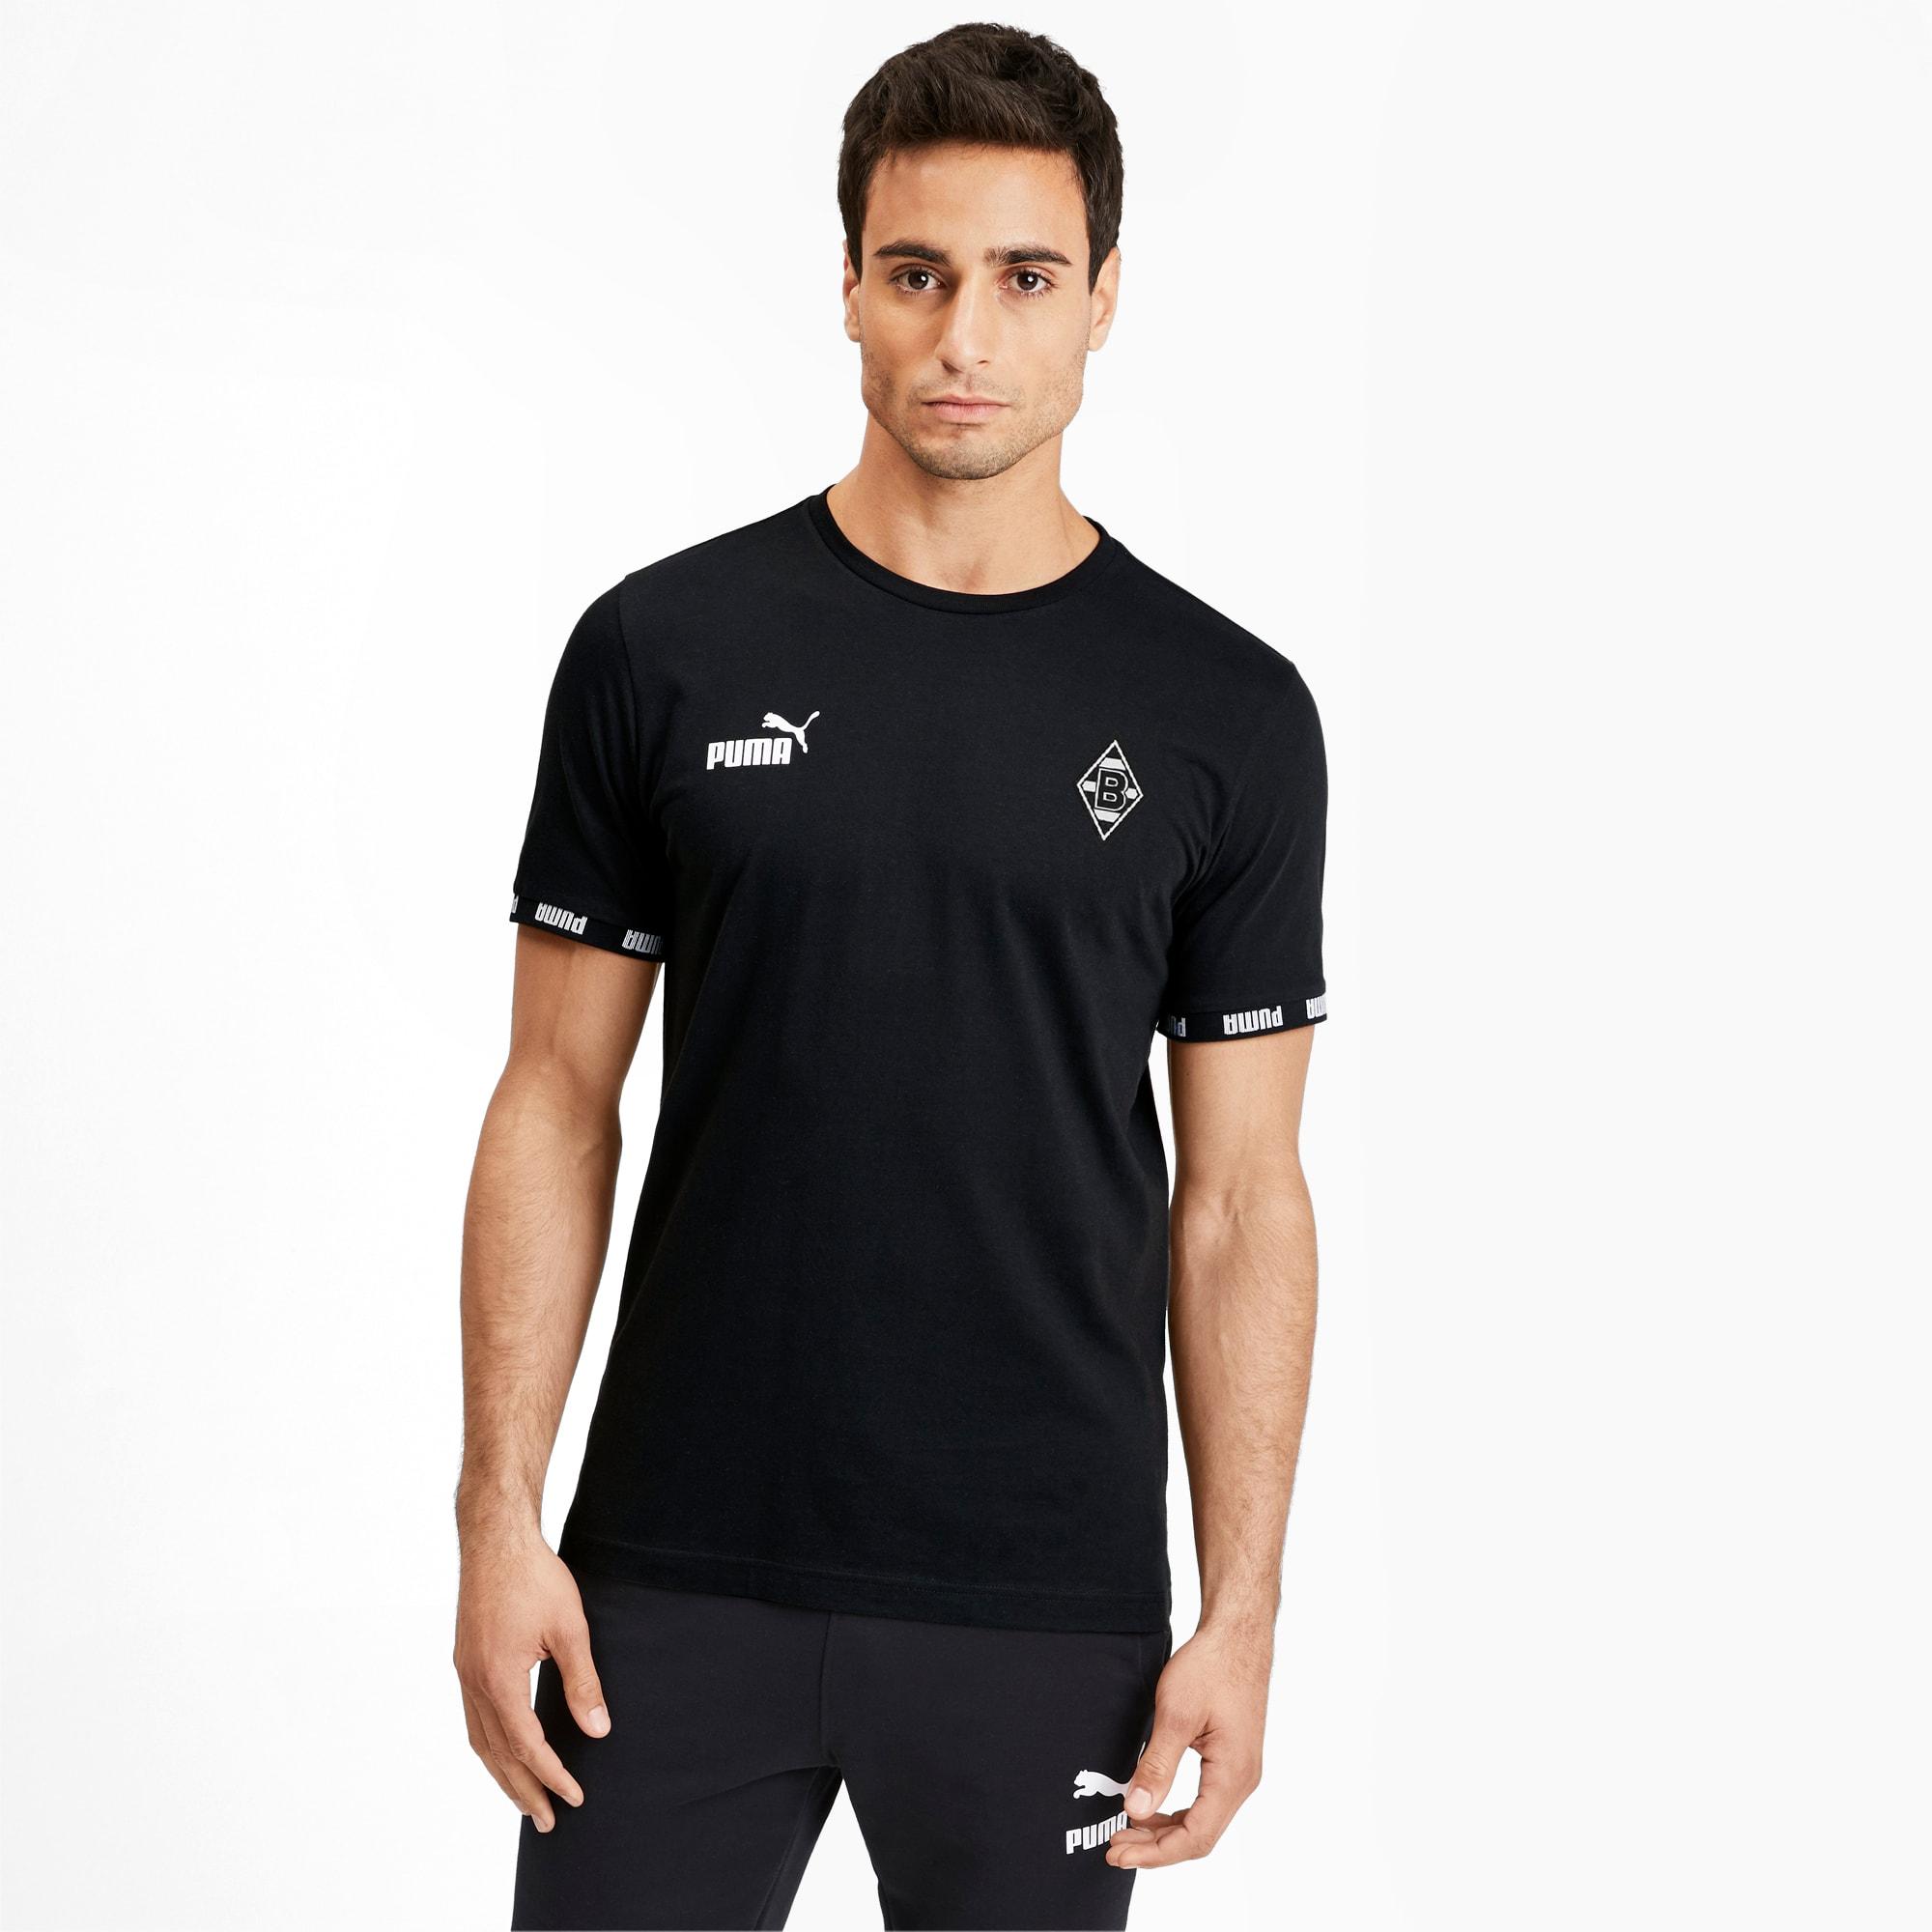 Borussia Mönchengladbach Football Culture Herren T Shirt